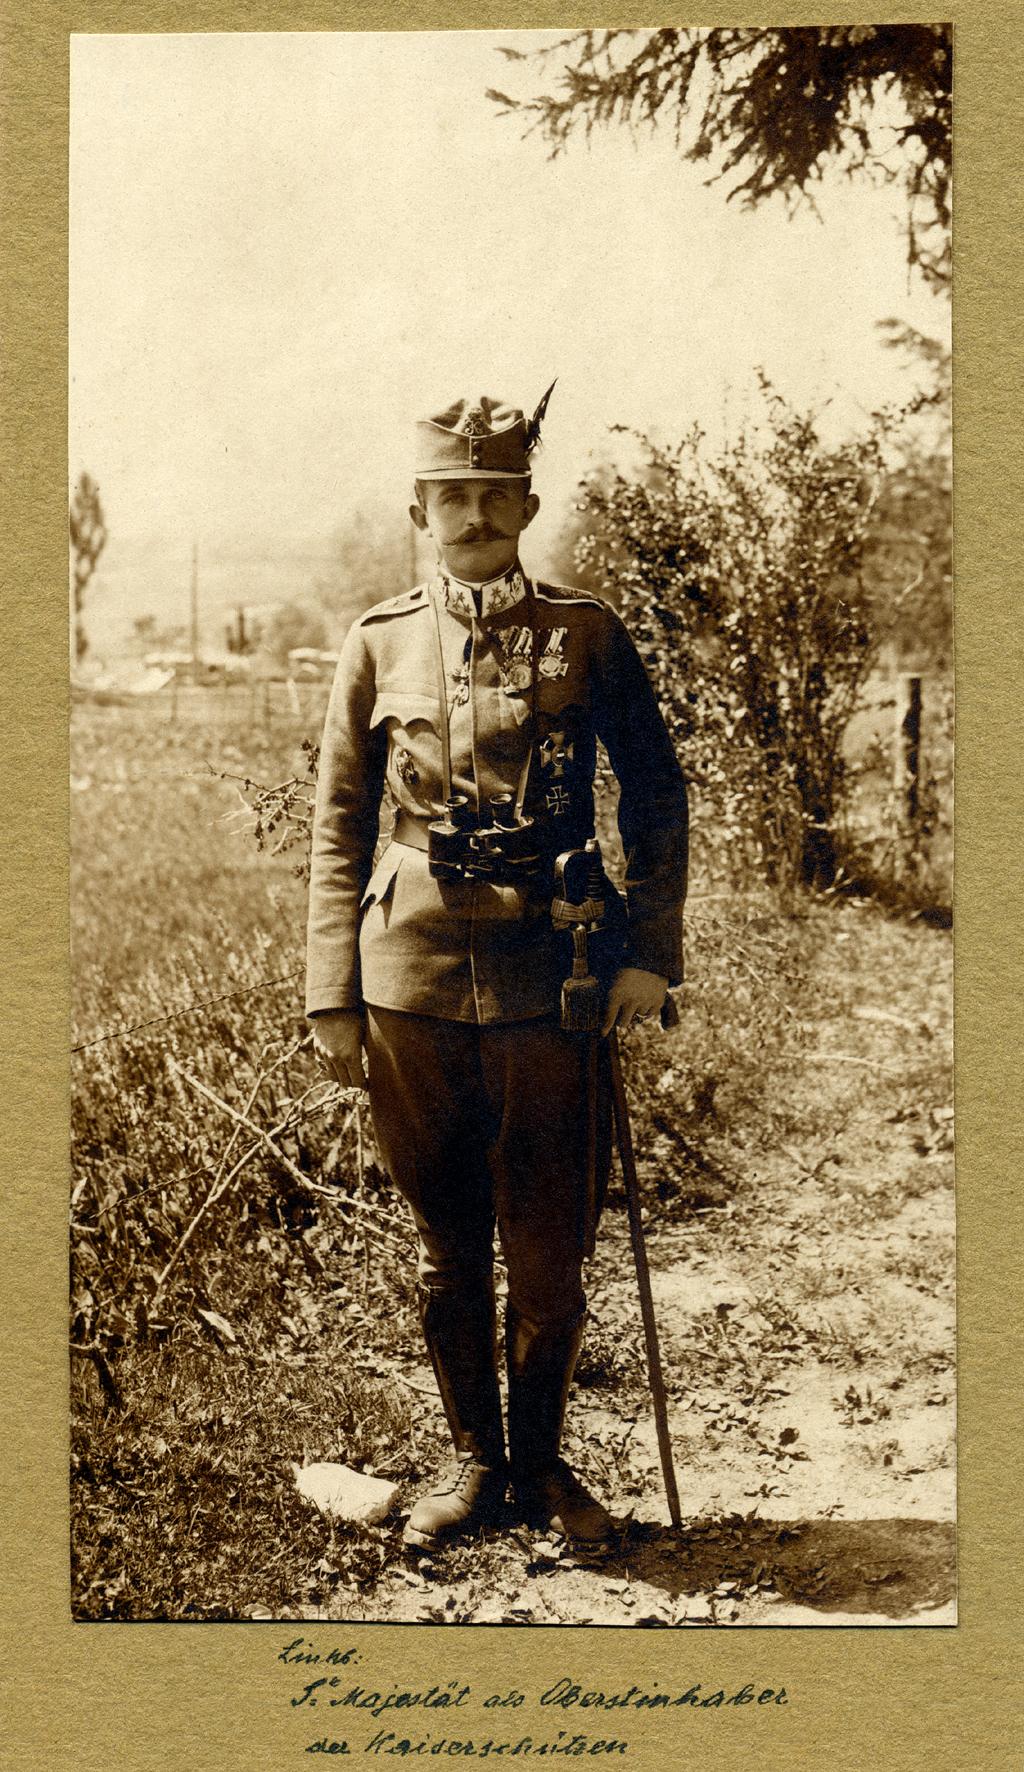 08 - Carlo in divisa da Kaiserschützen.JPG